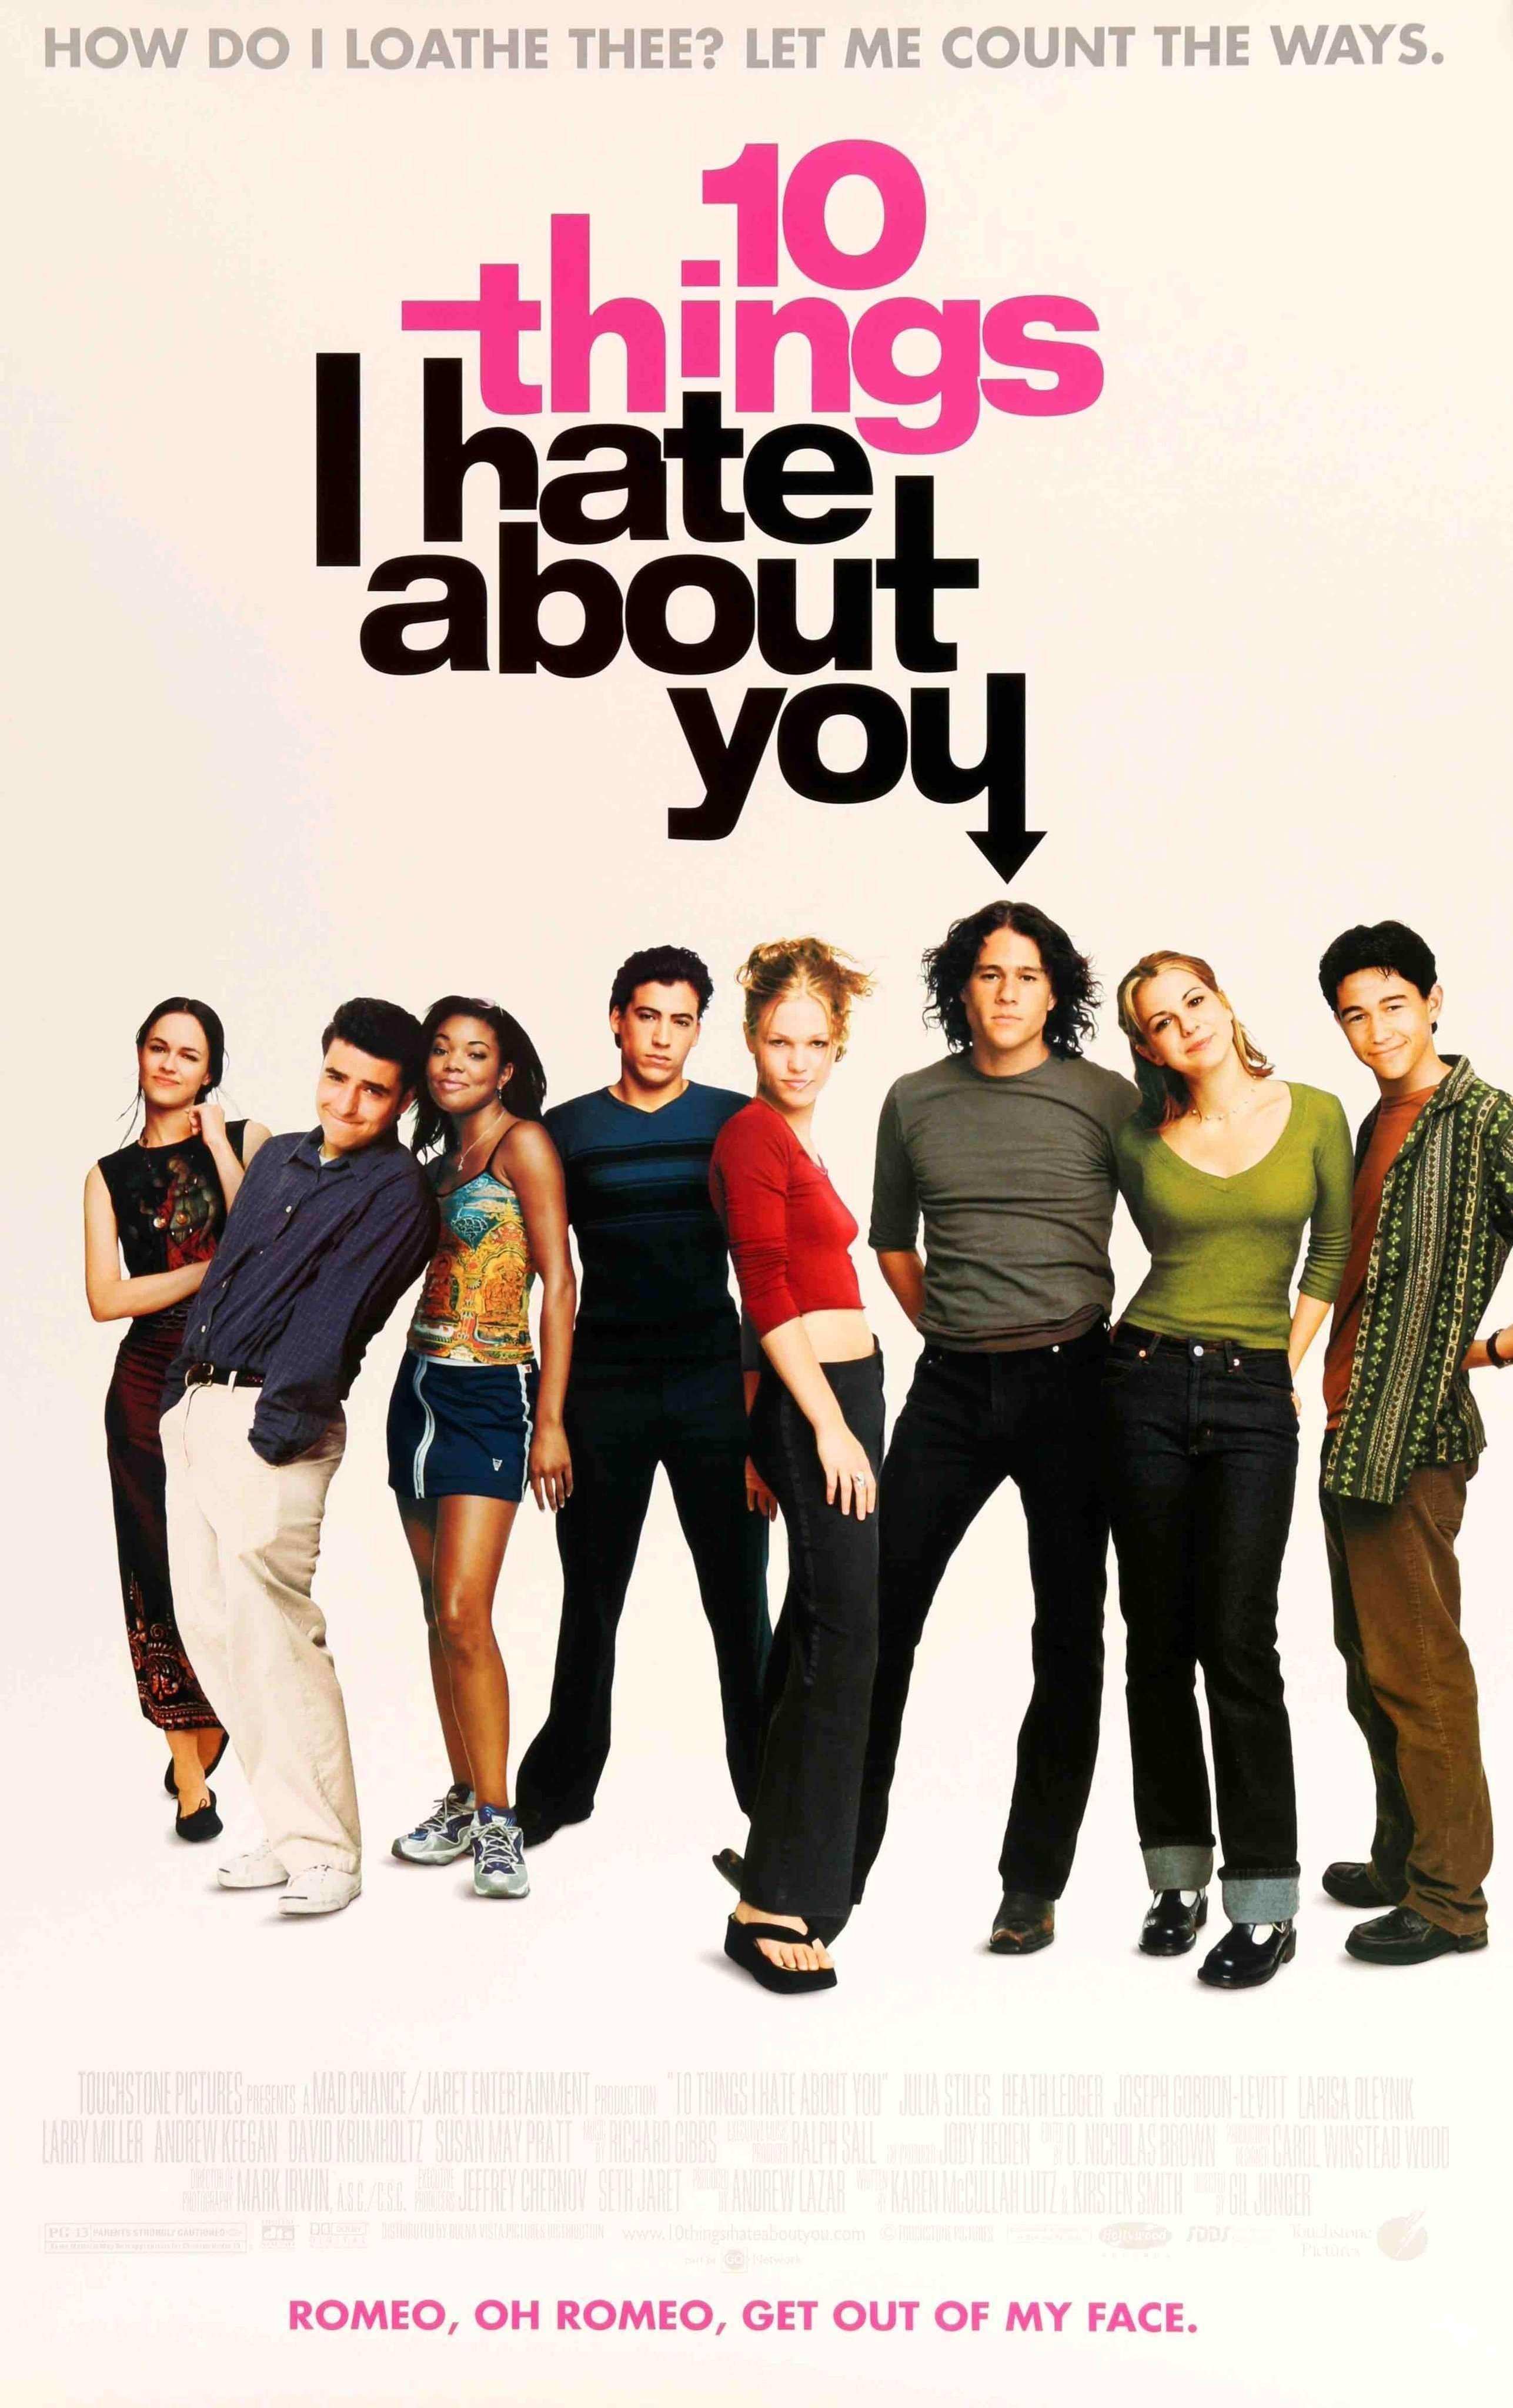 10 things i hate about you 1999 i i i i i i i i i i i i i